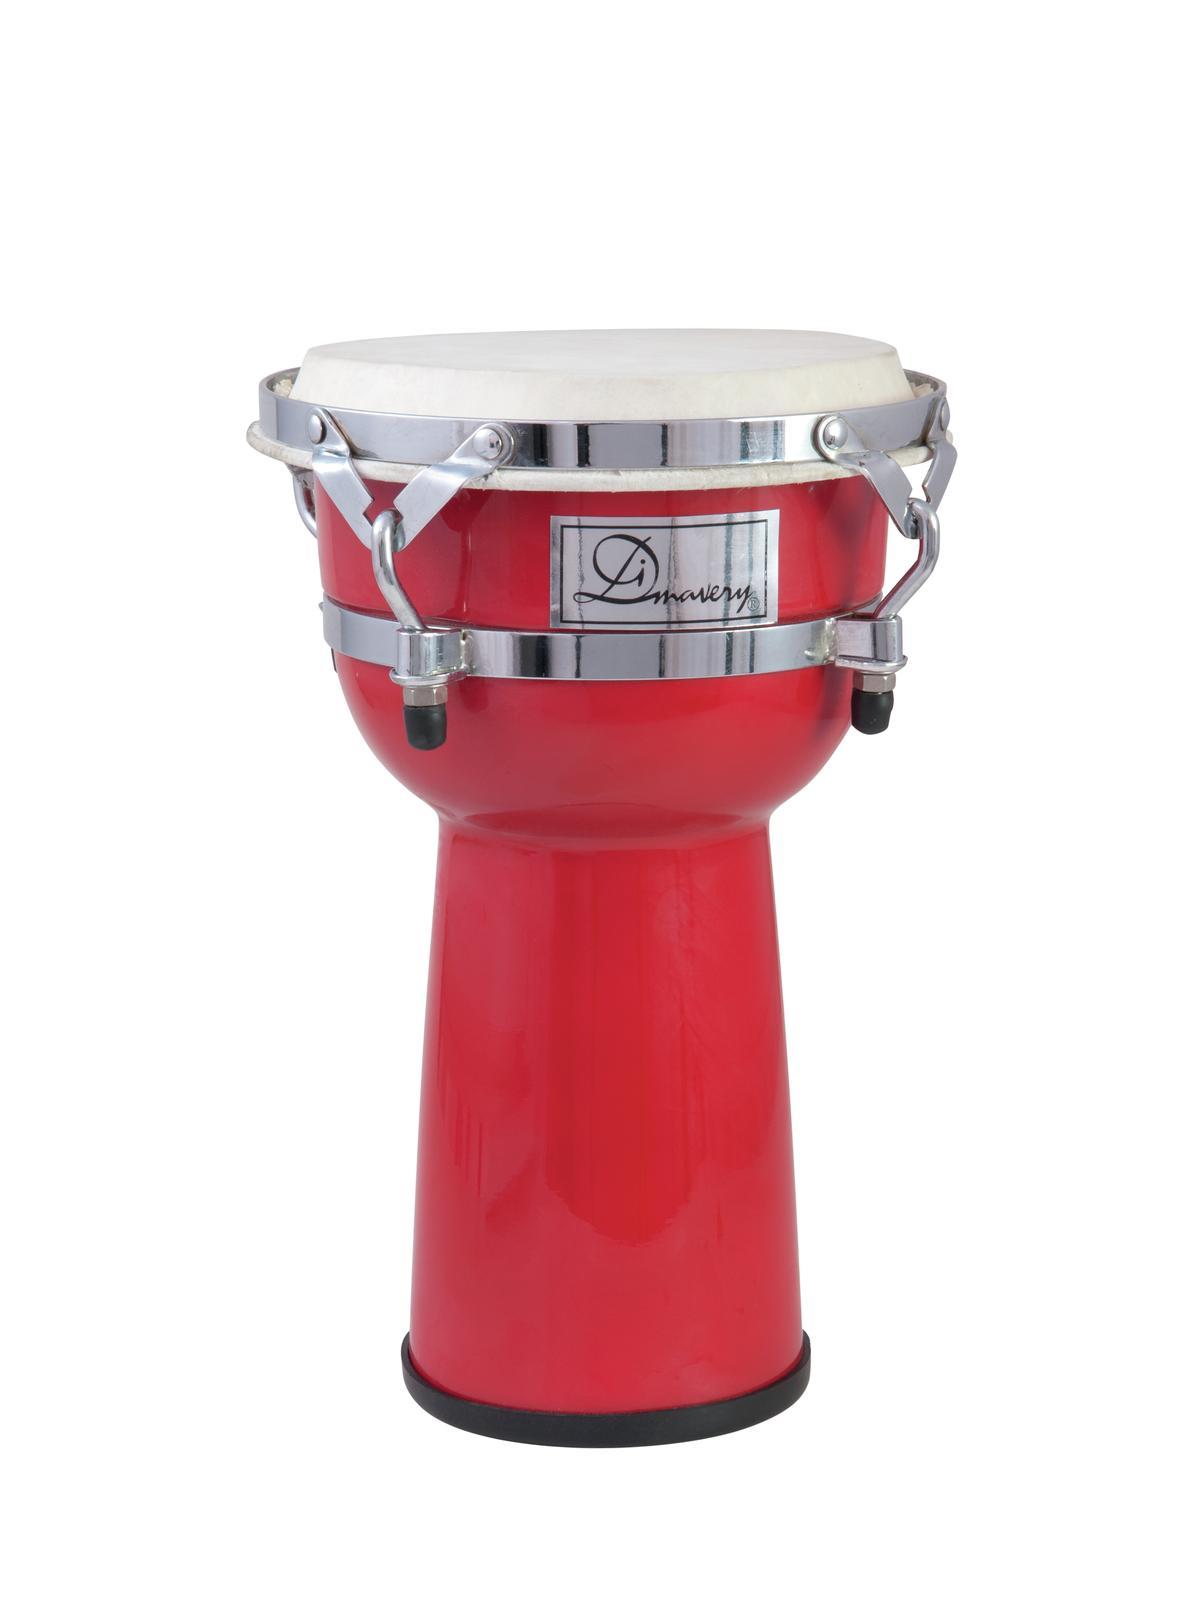 Djembe, tamburo, bongo, in plastica, rosso, DIMAVERY DJC-108